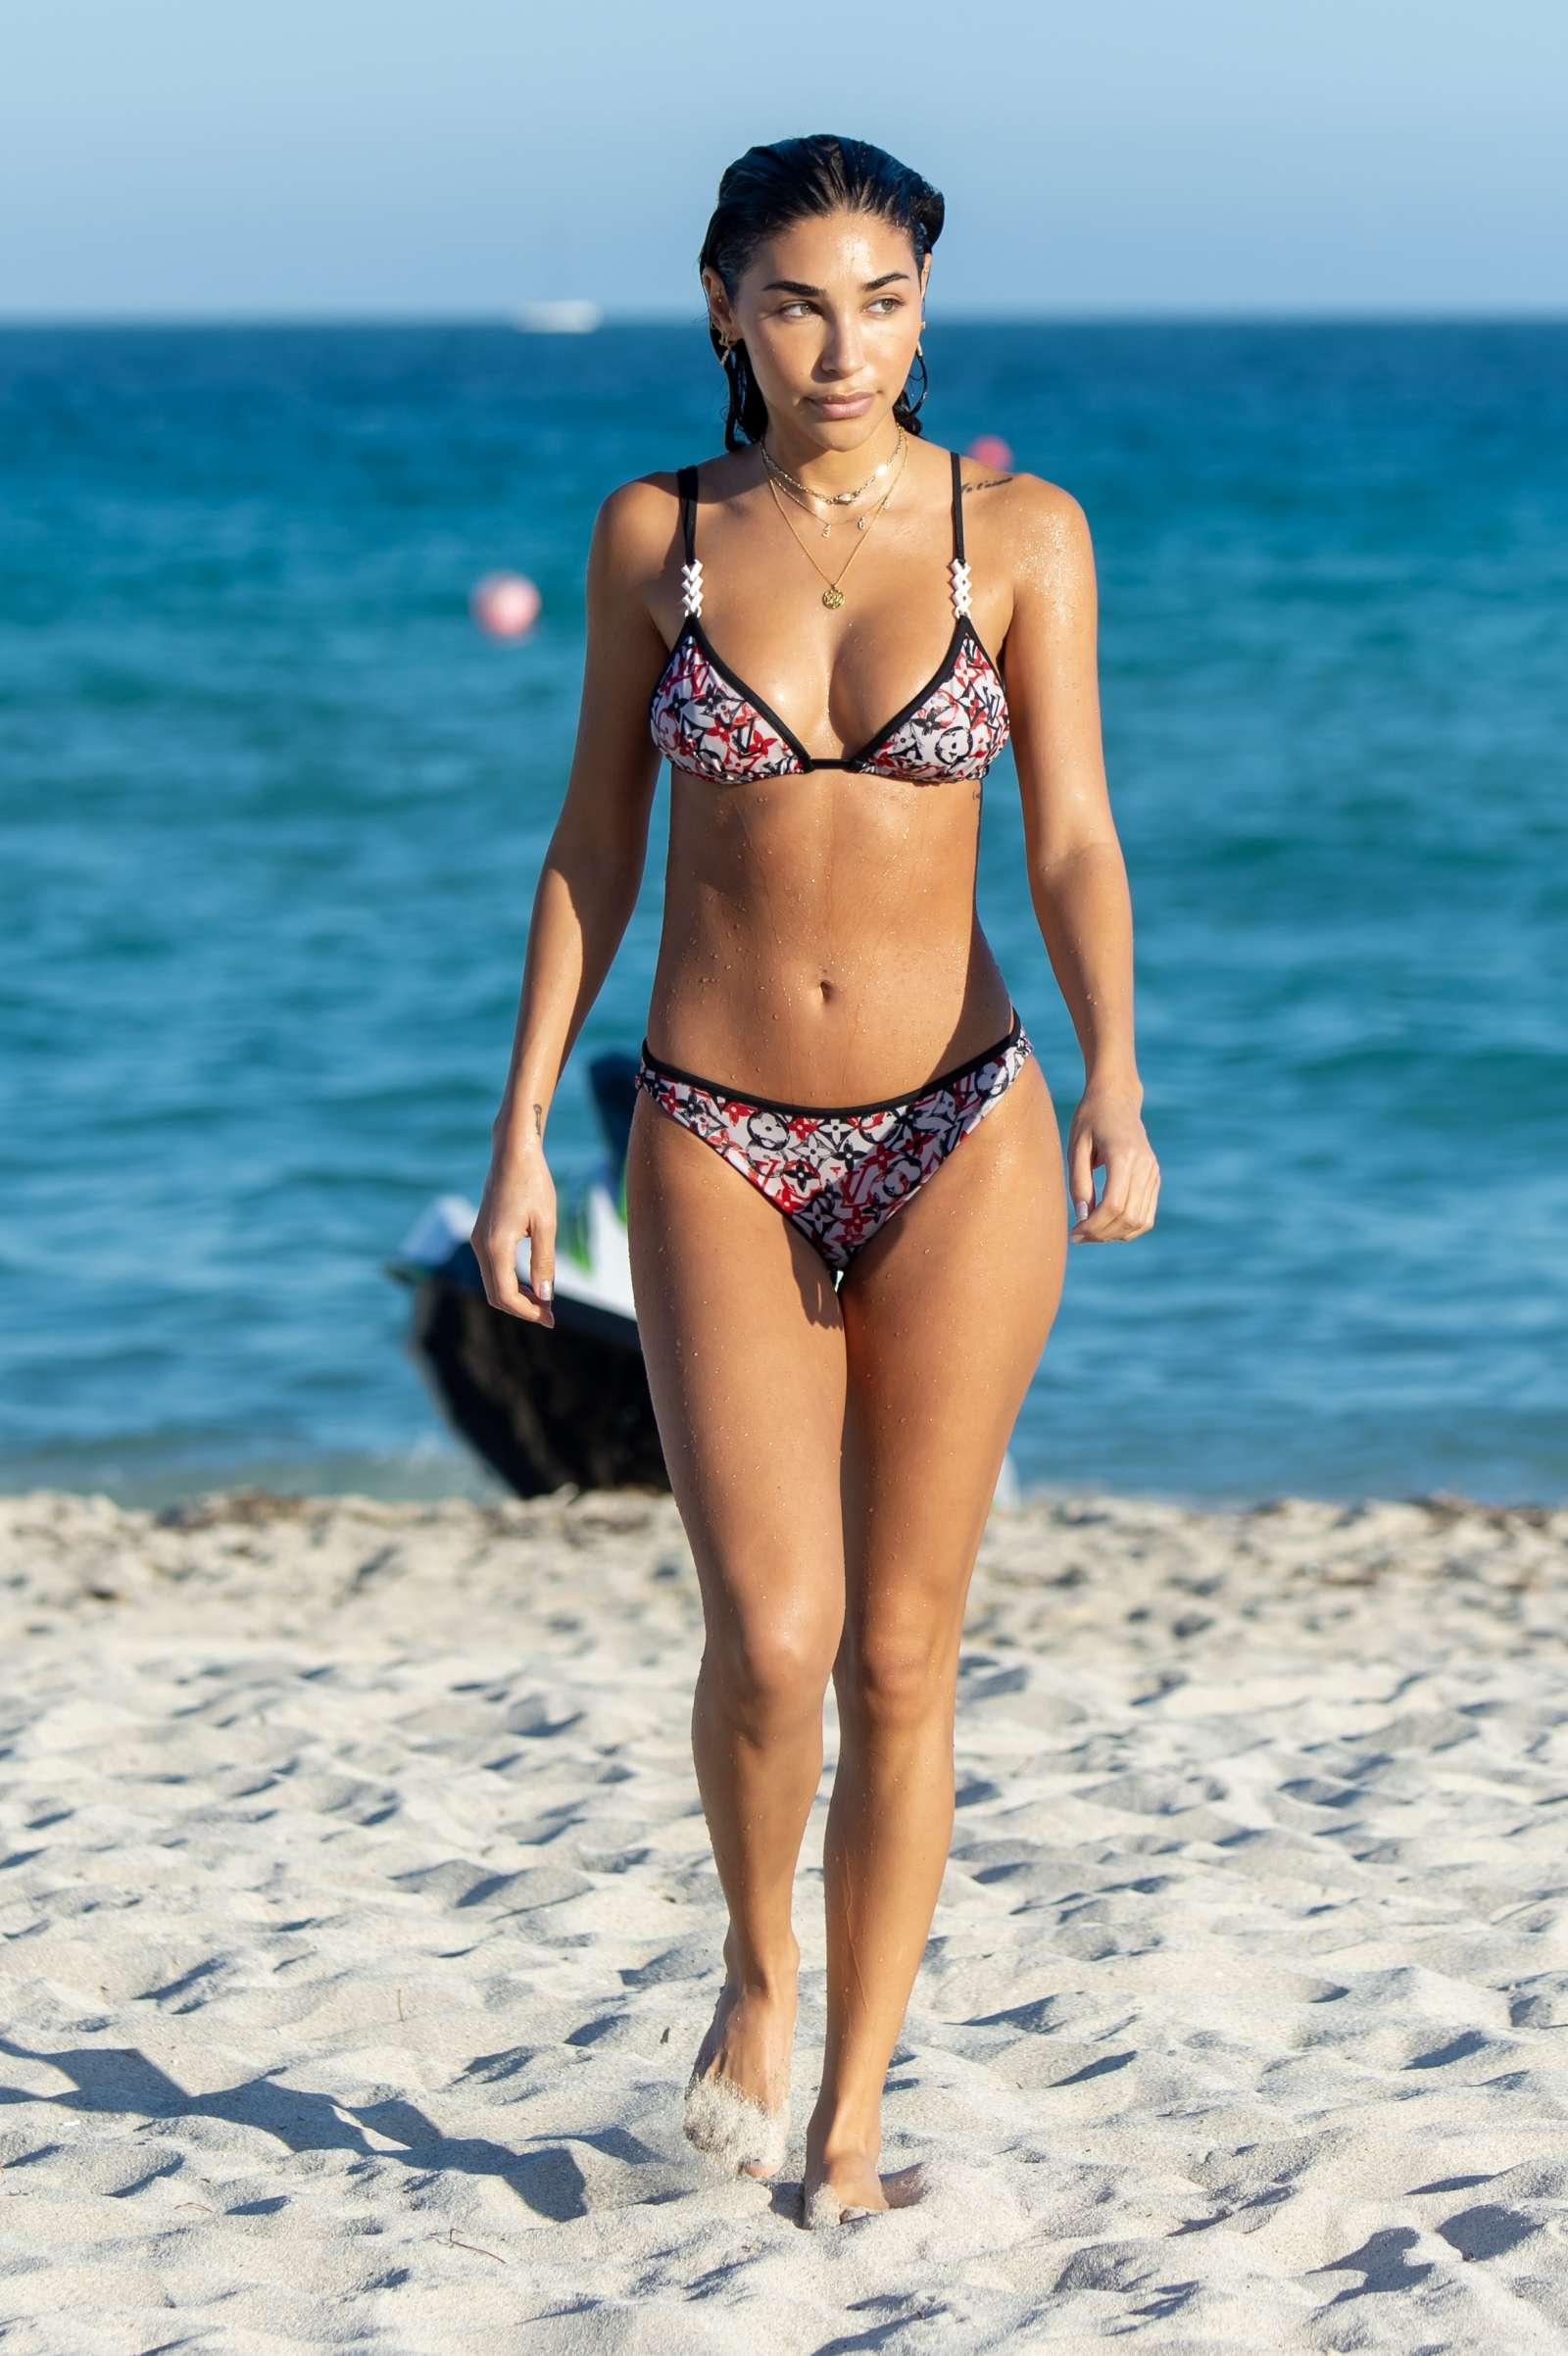 Chantel Jeffries 2018 : Chantel Jeffries in Bikini 2018 -13